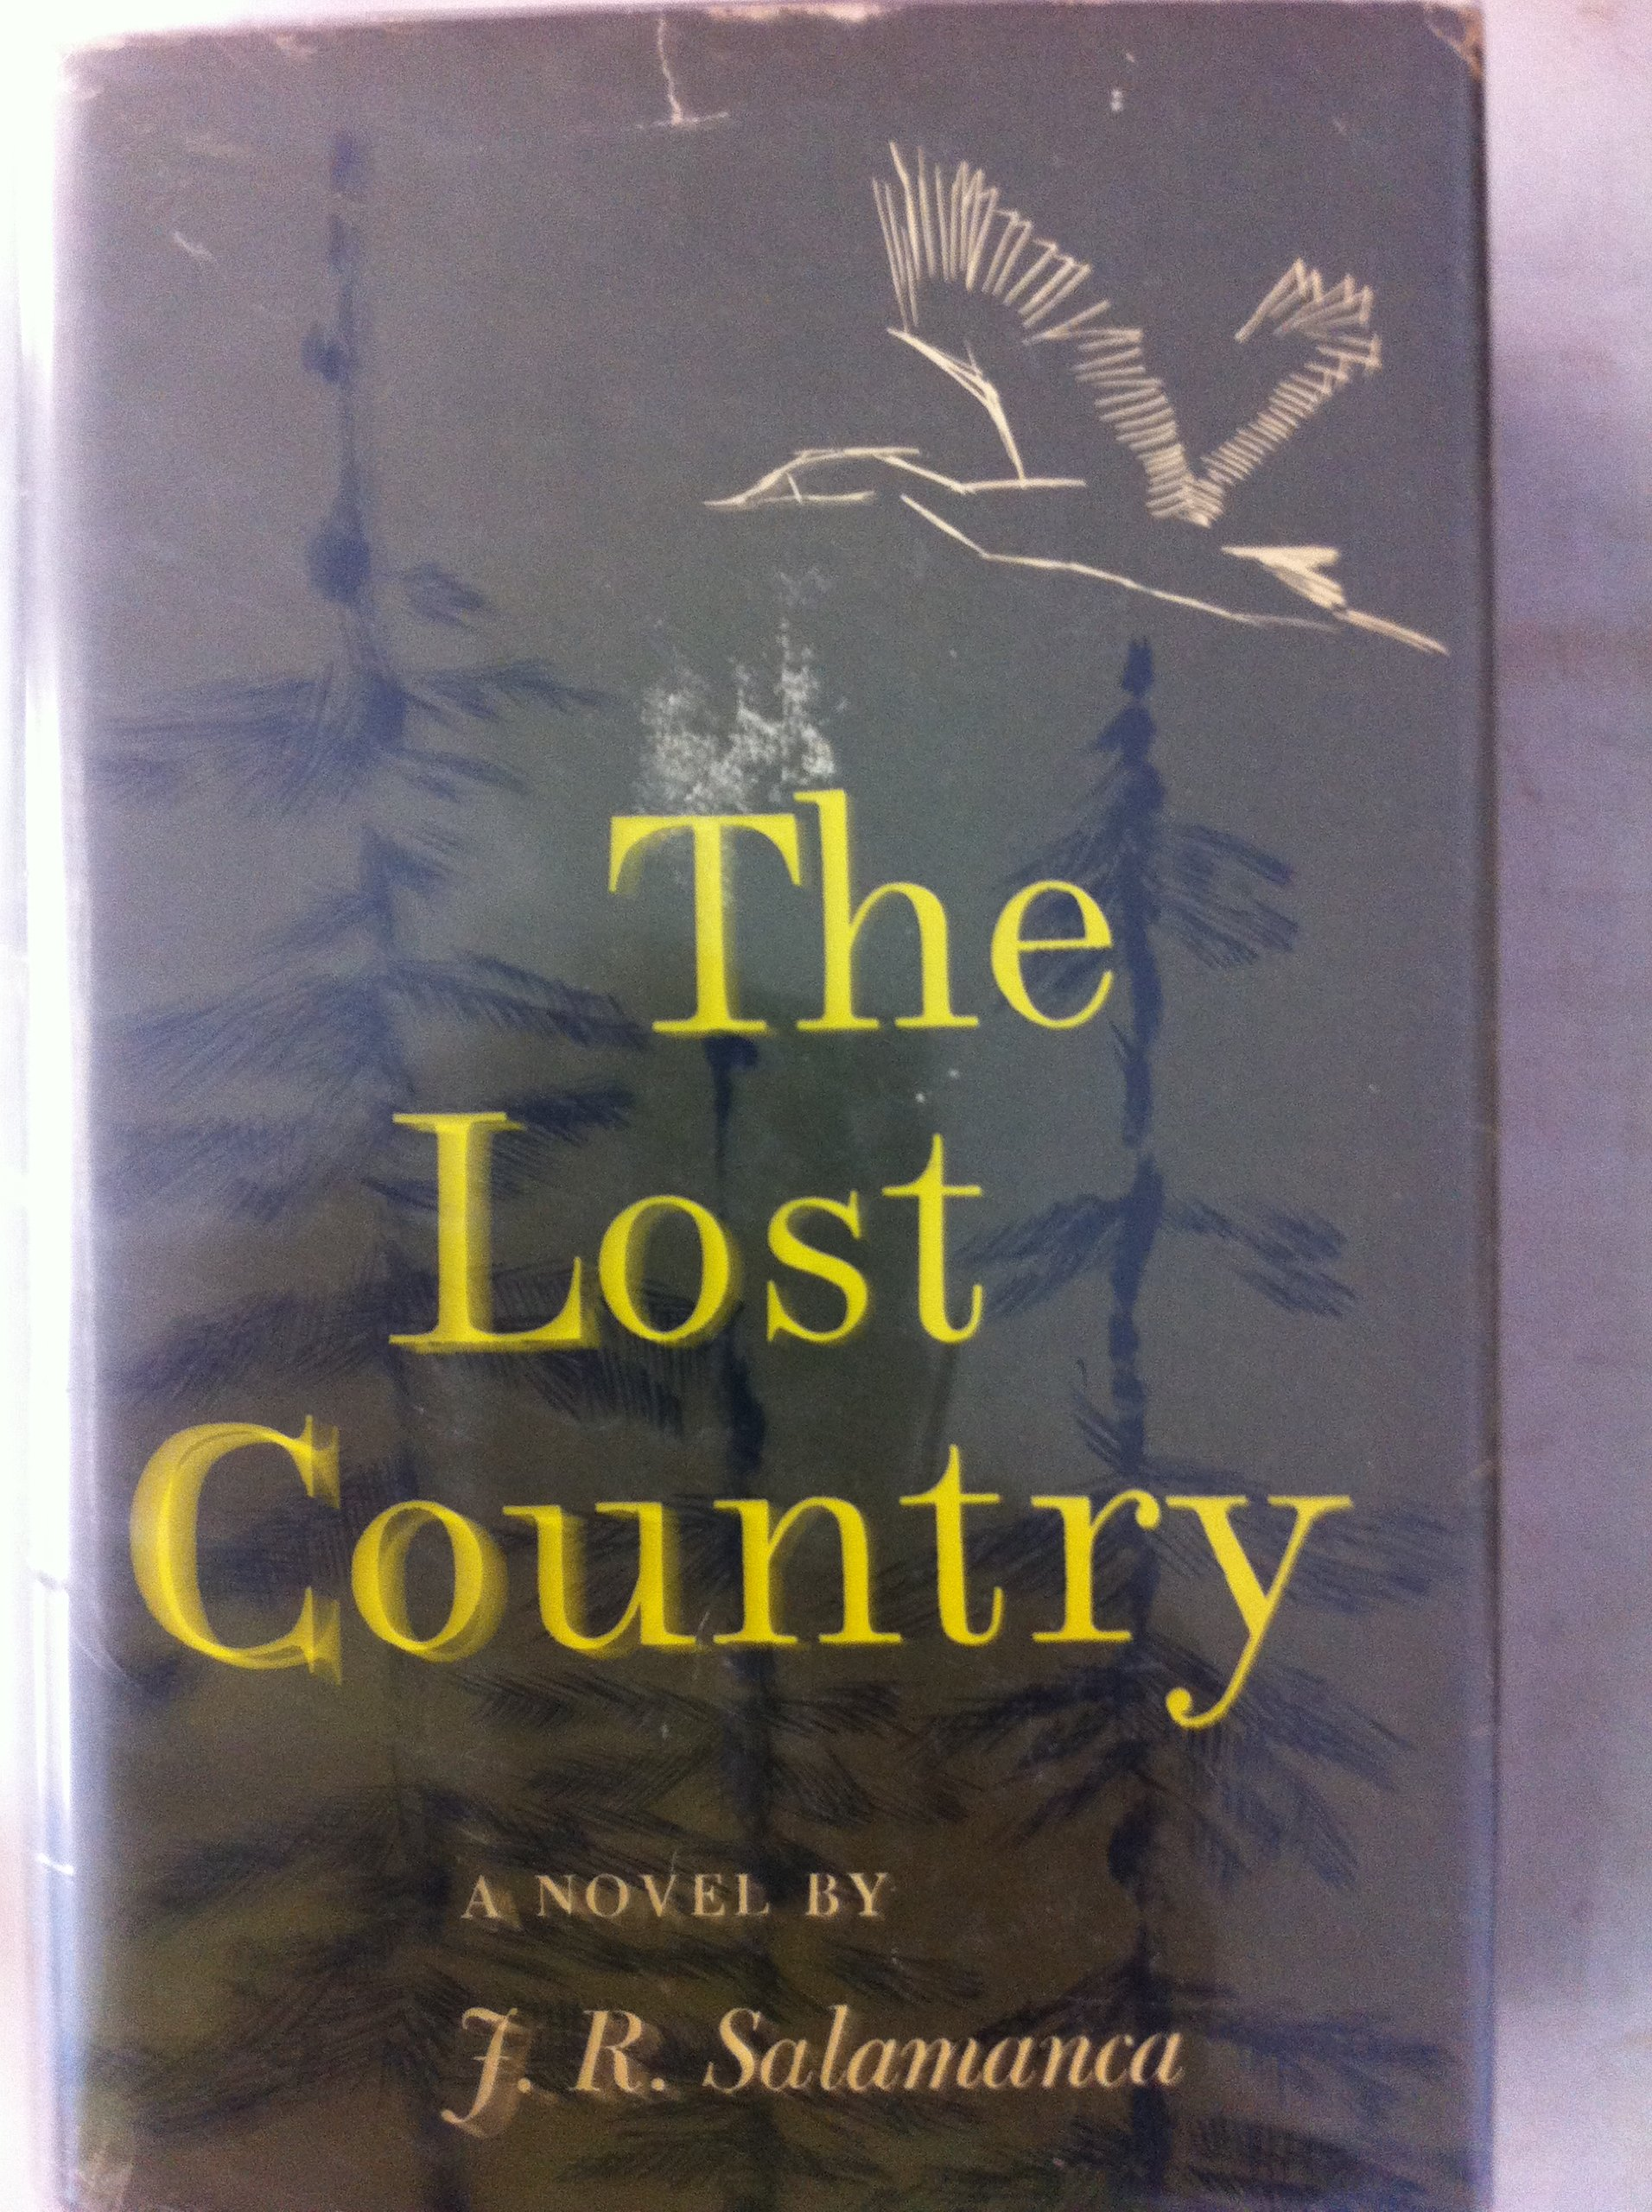 Amazon.com: The lost country;: A novel: J. R Salamanca: Books